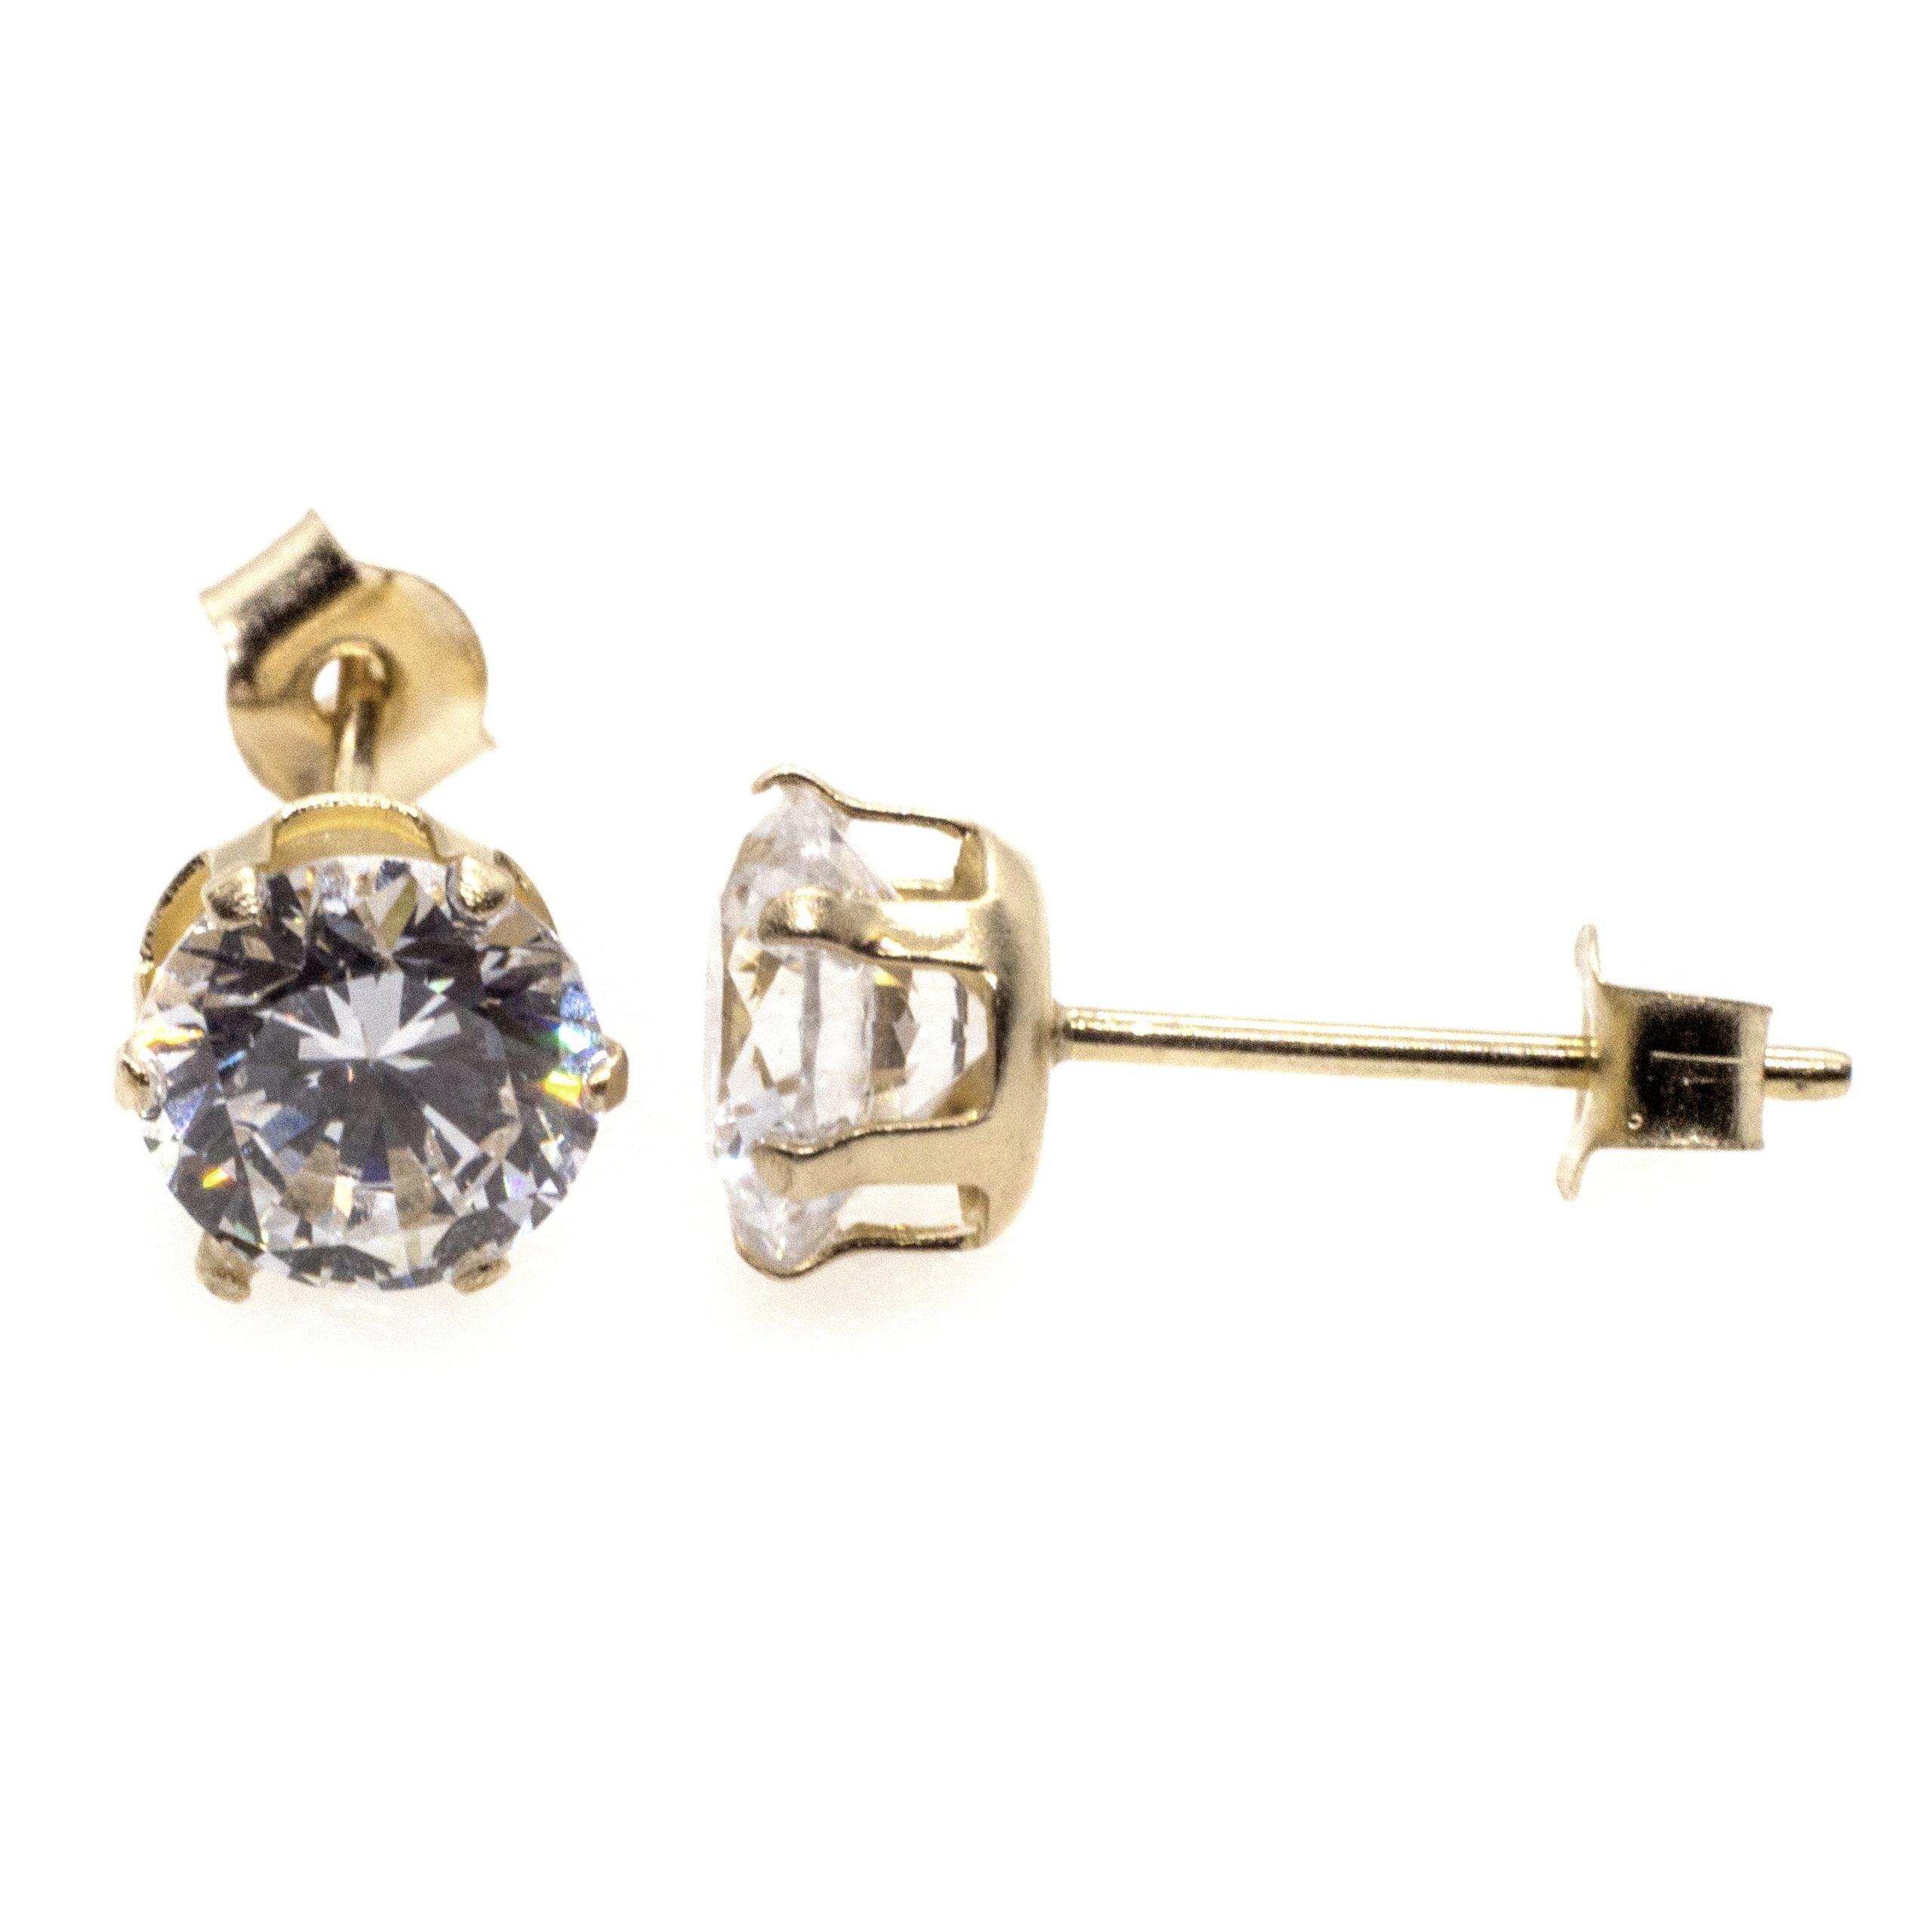 5mm CZ stud earrings 9ct yellow gold alt 5